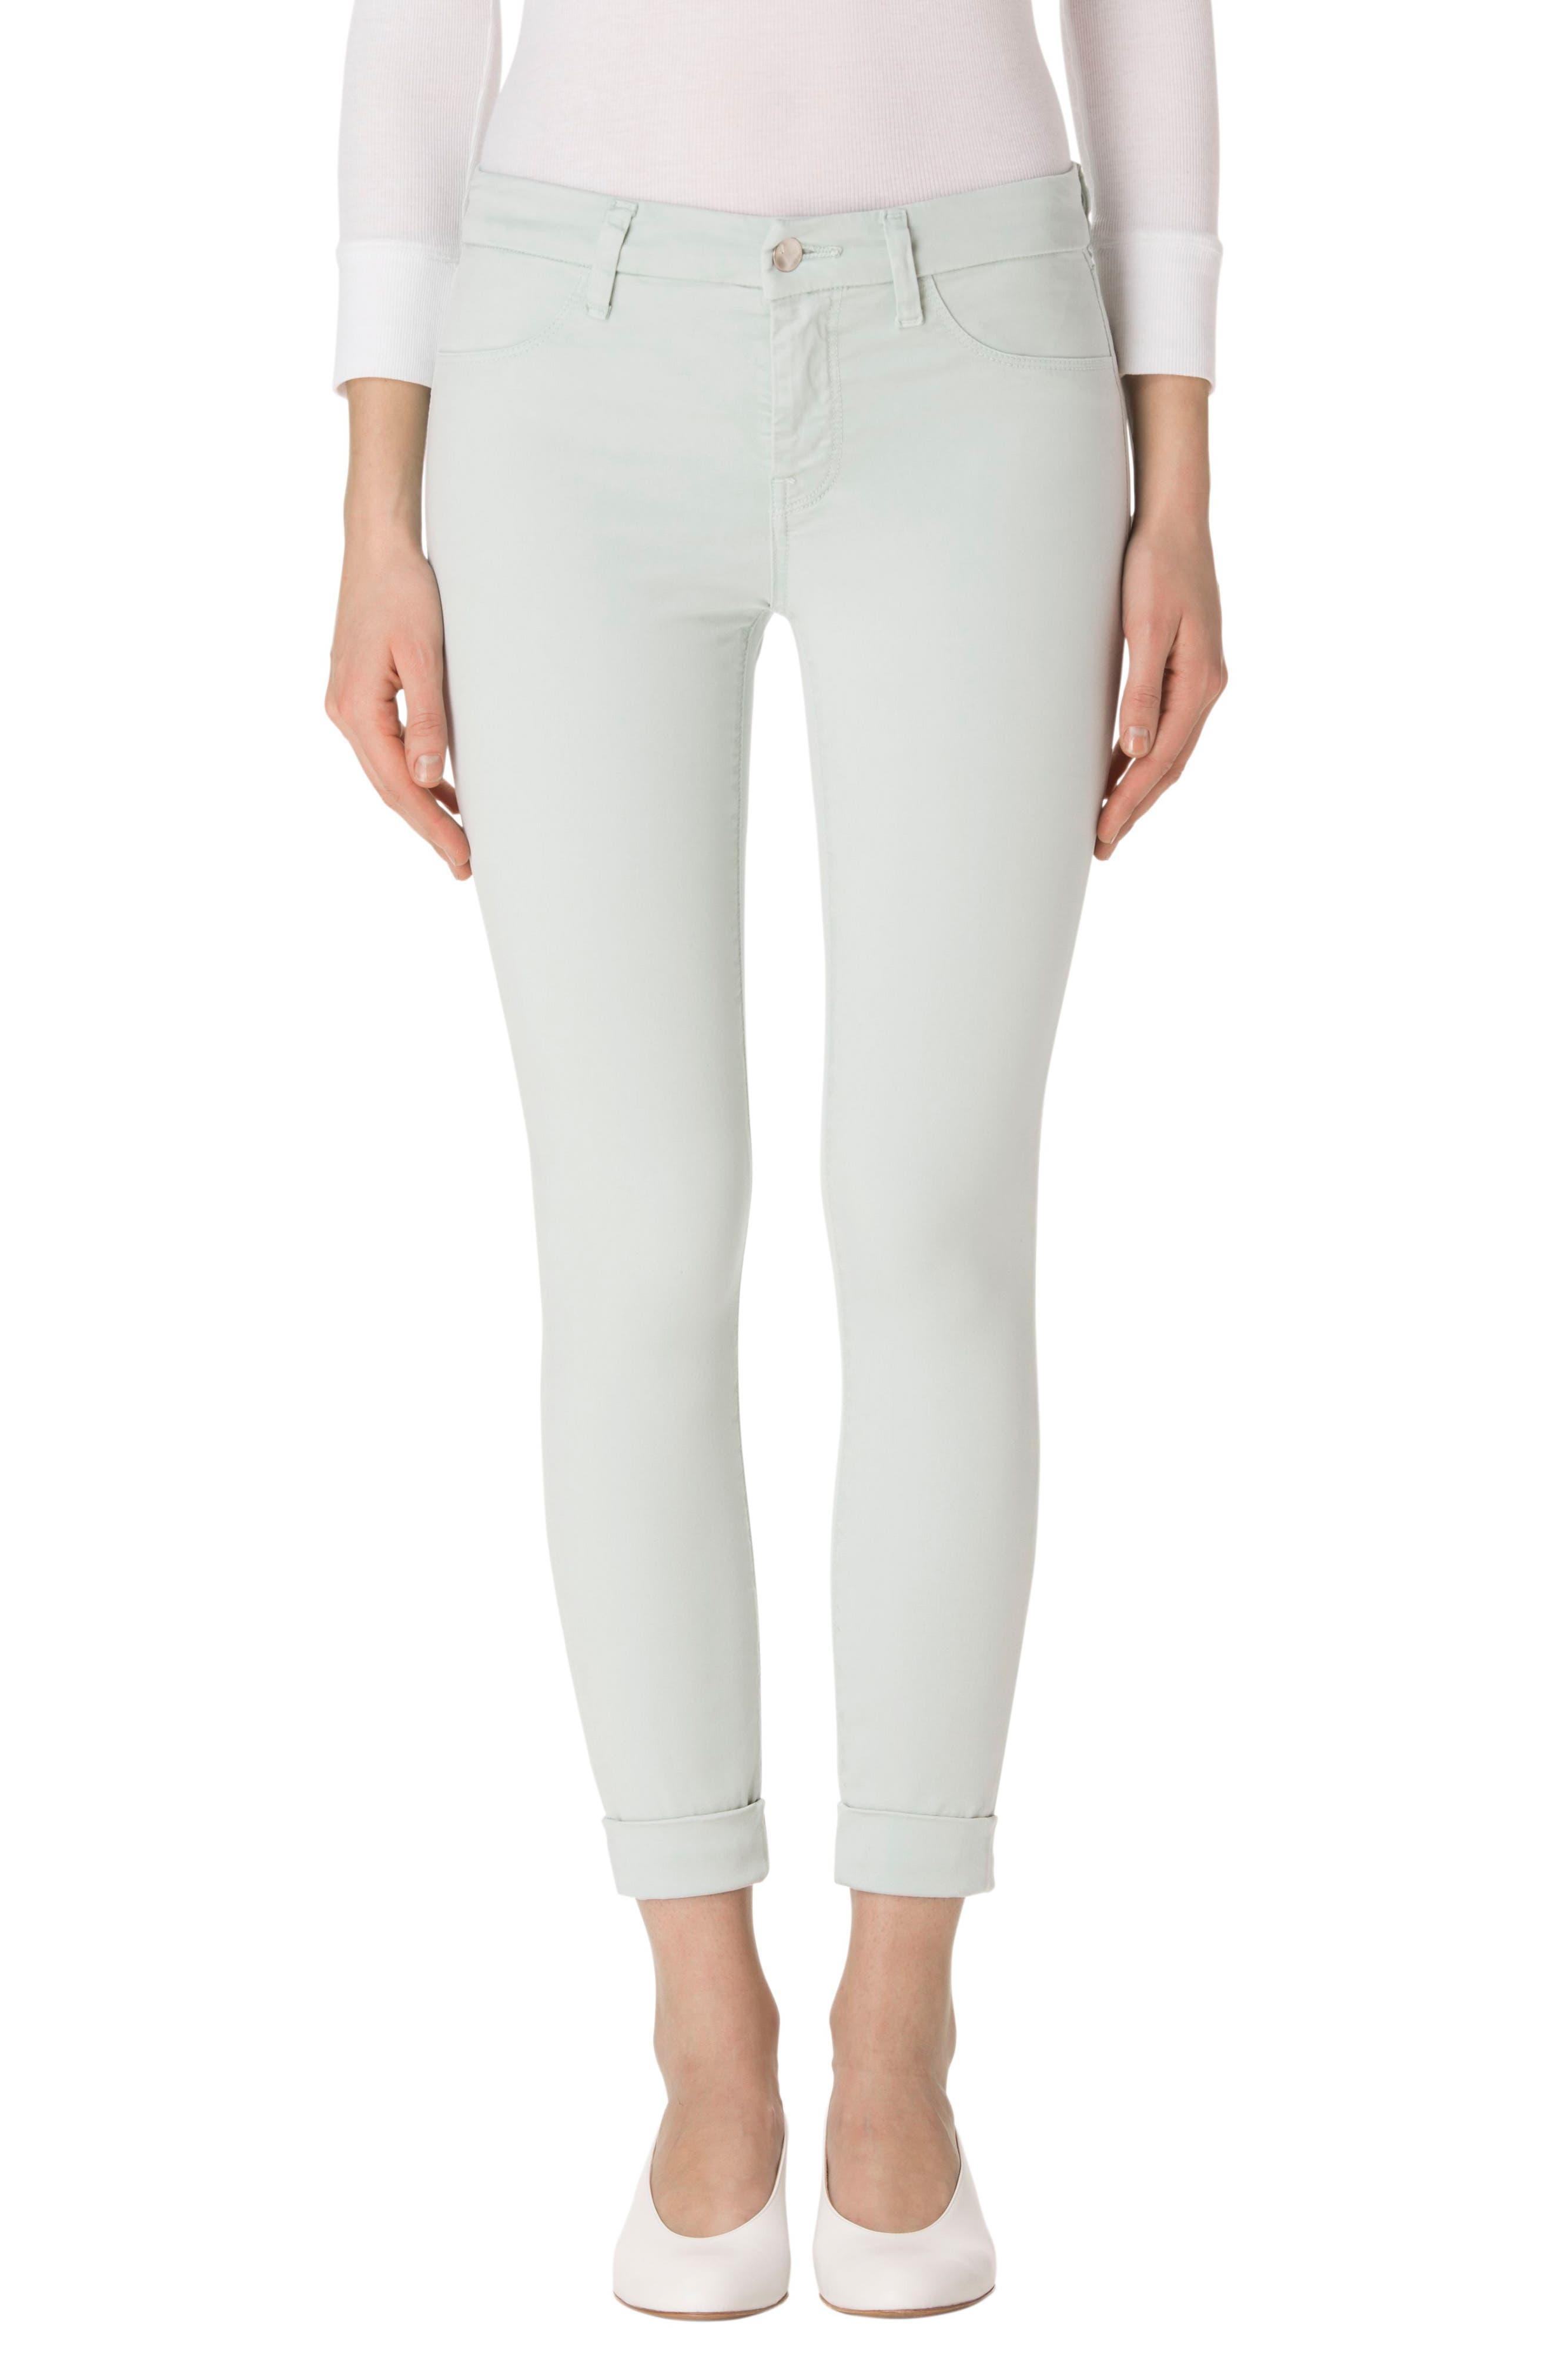 J BRAND Anja Cuffed Crop Skinny Jeans